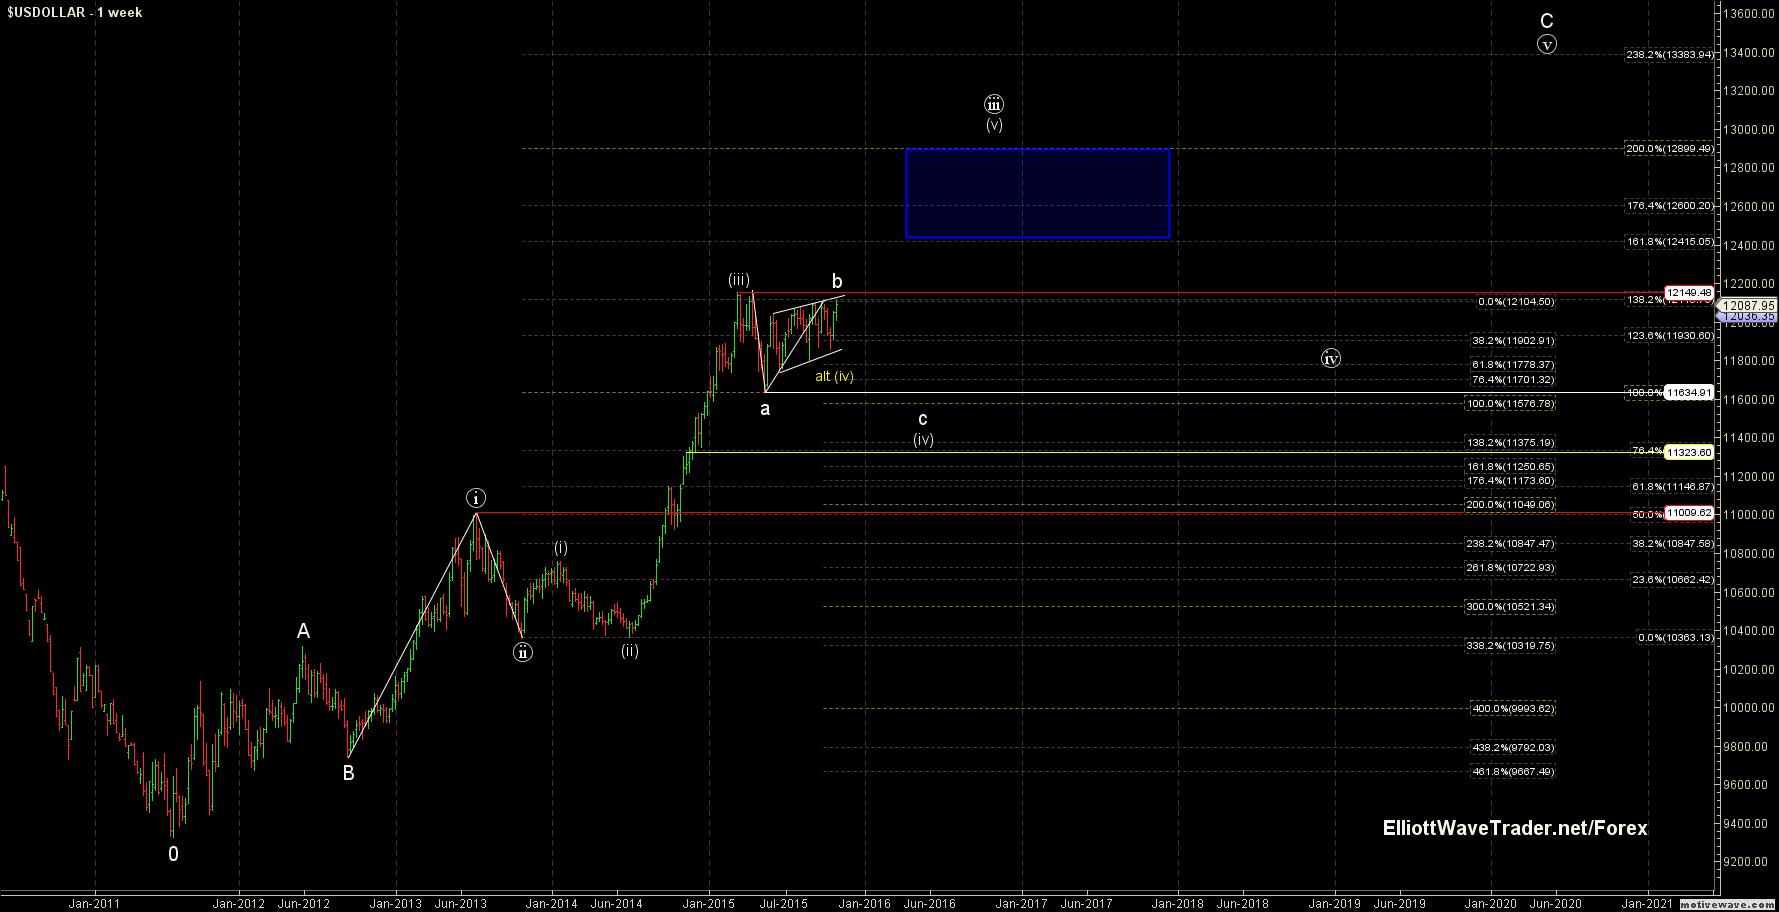 fxcm charts